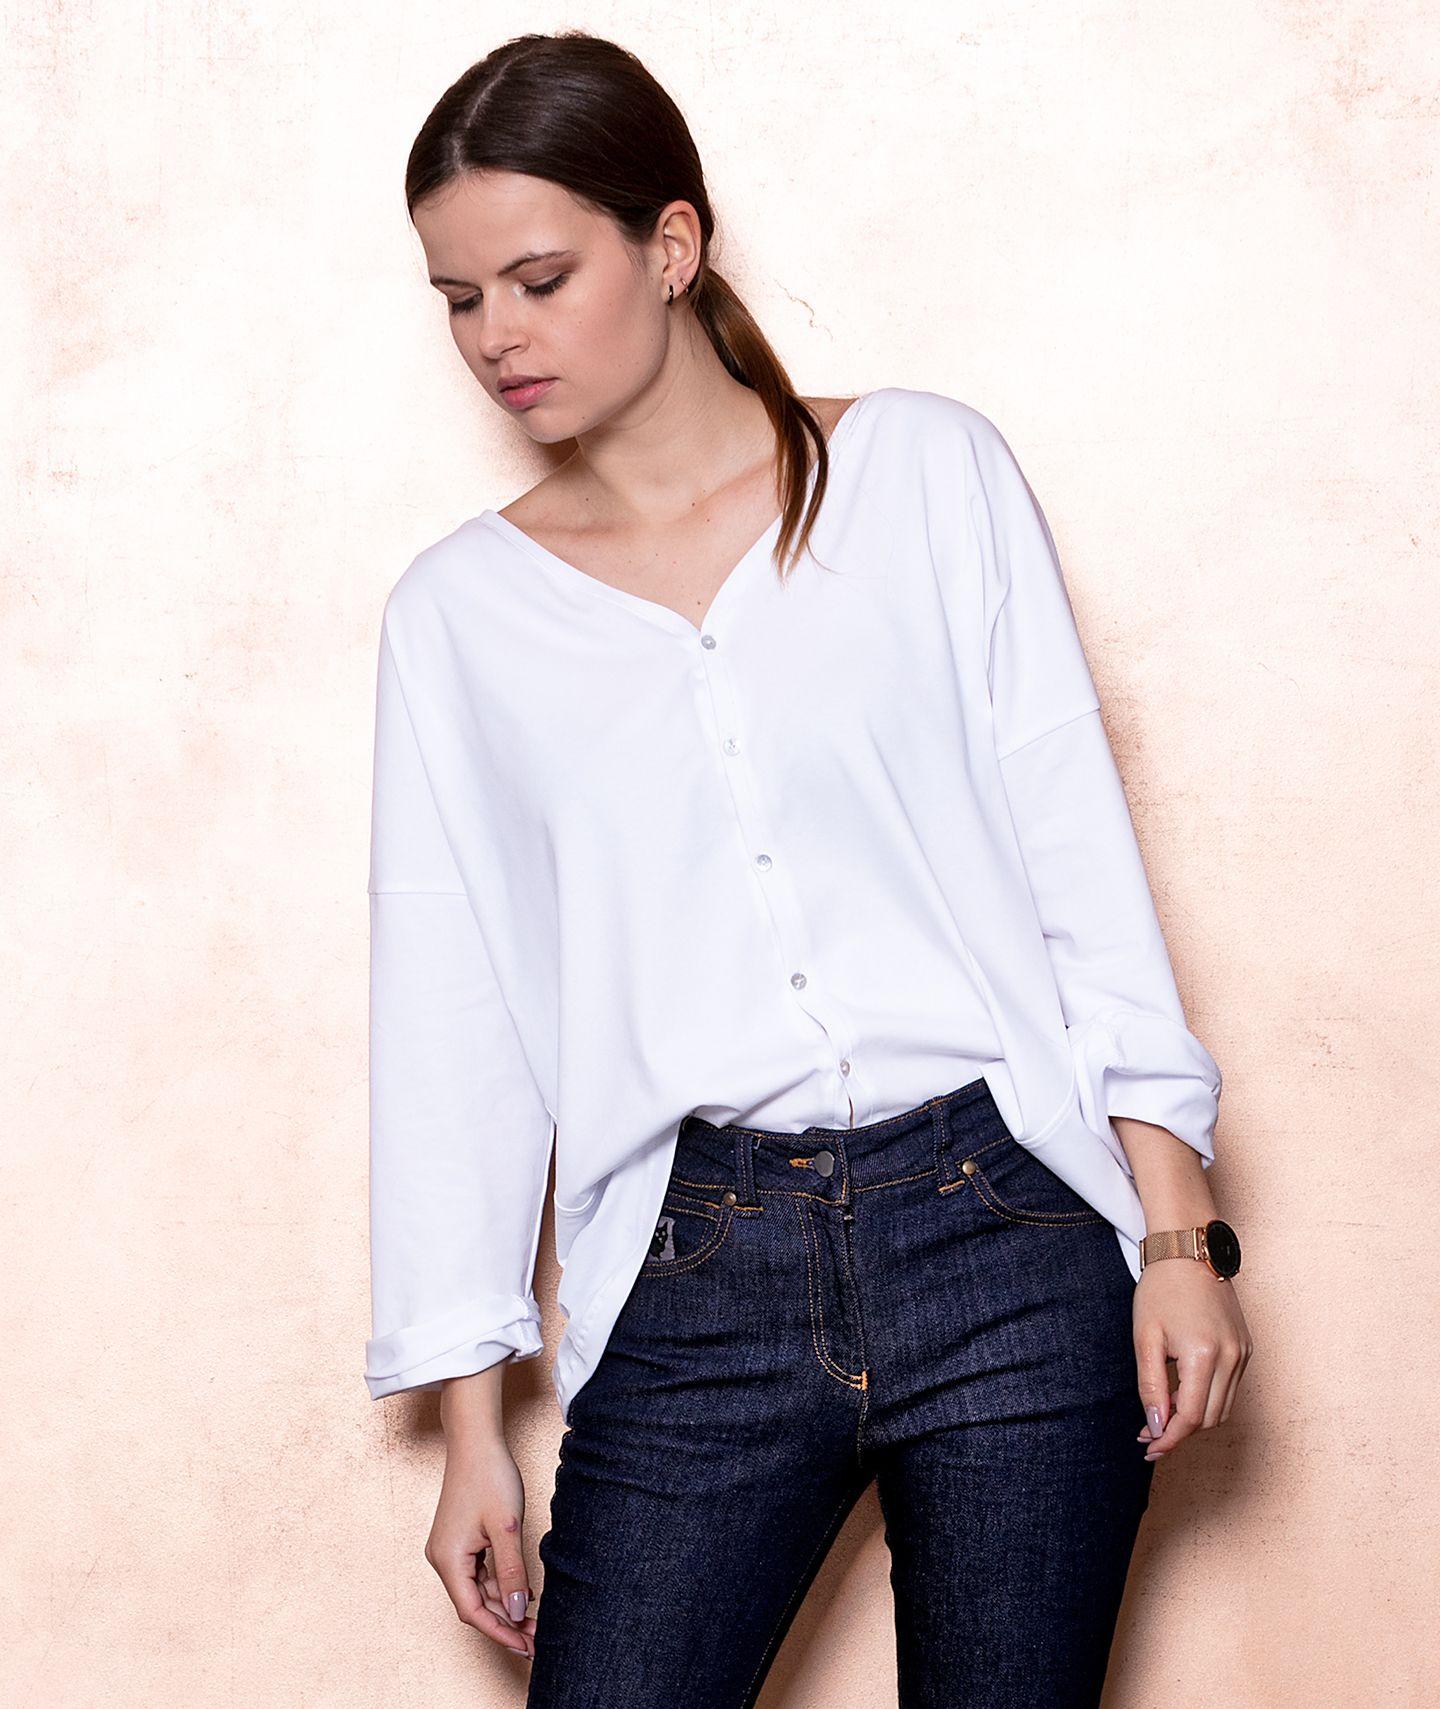 bluzka MARTINI white blouse